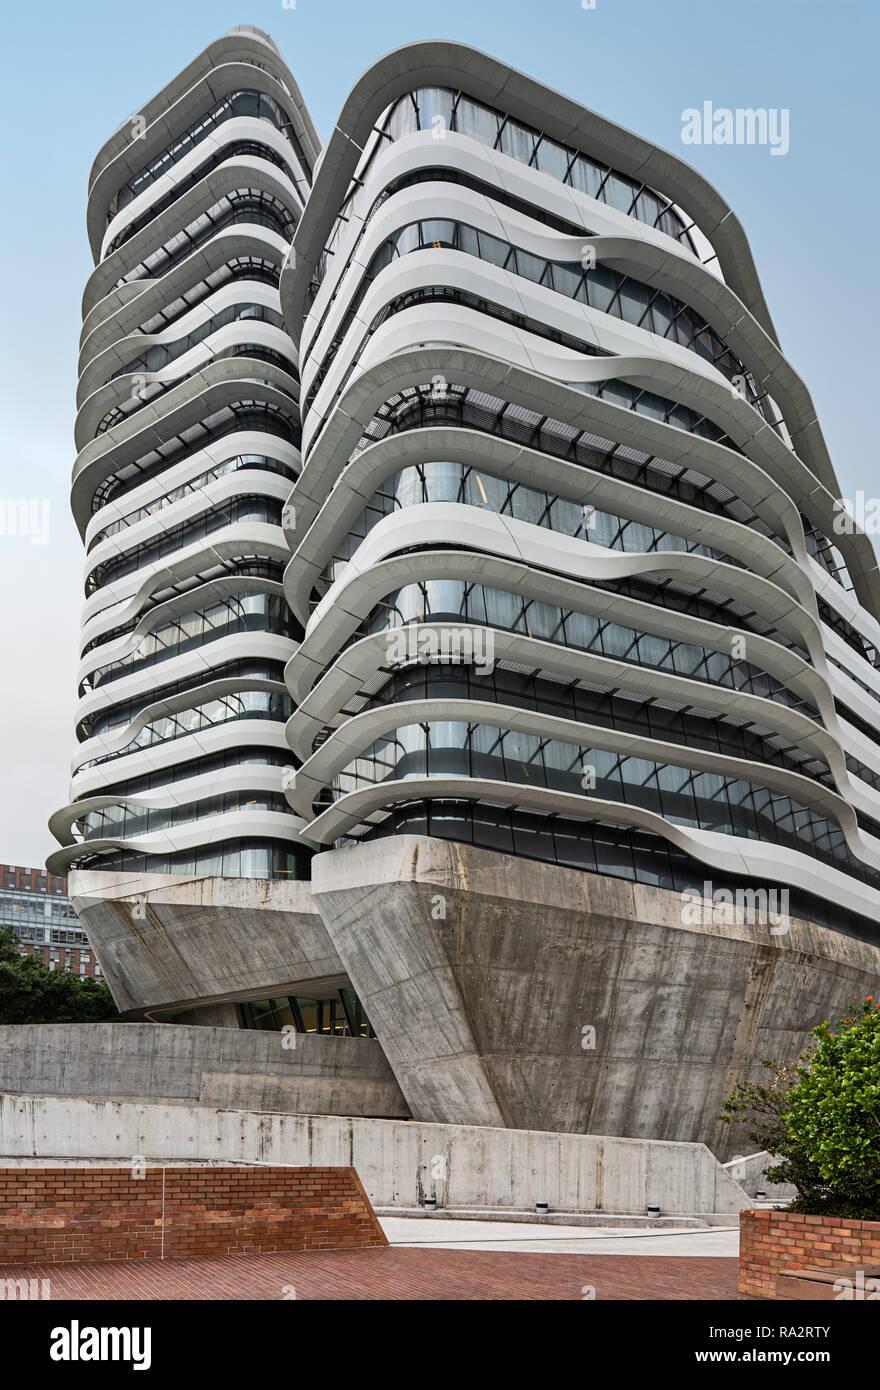 Jockey Club Innovation Tower at Hong Kong Polytechnic University Stock Photo